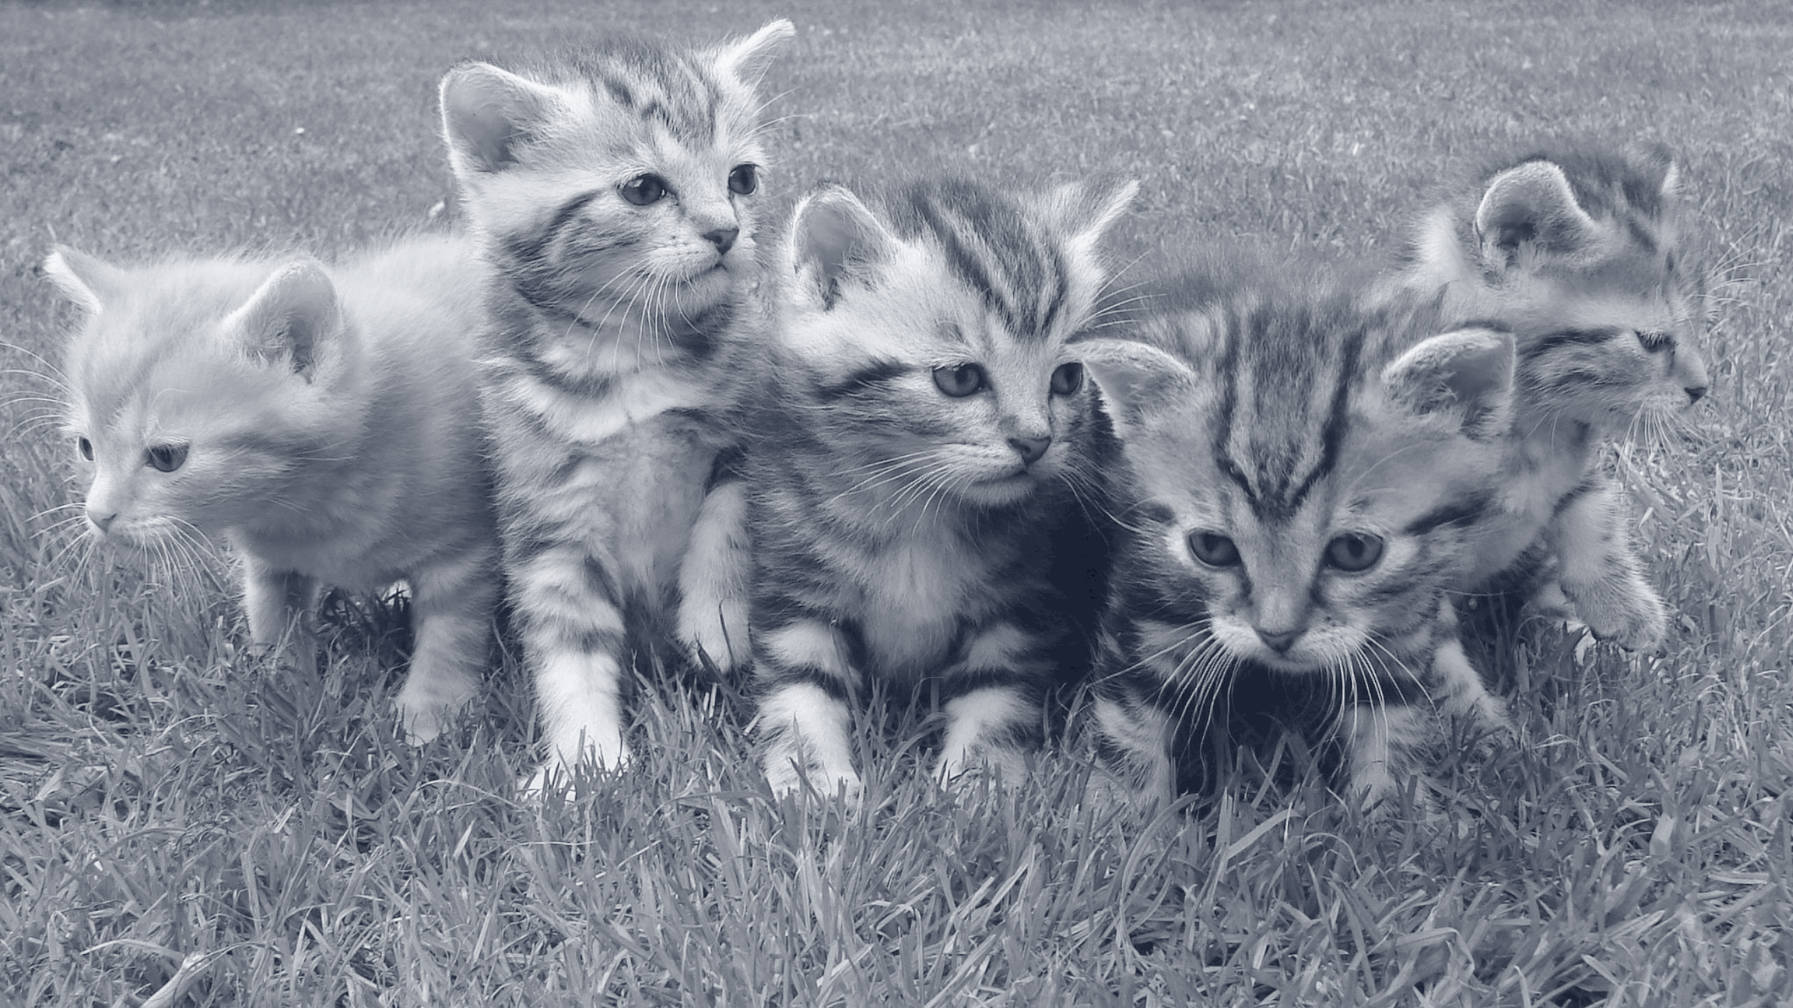 kittens-gray